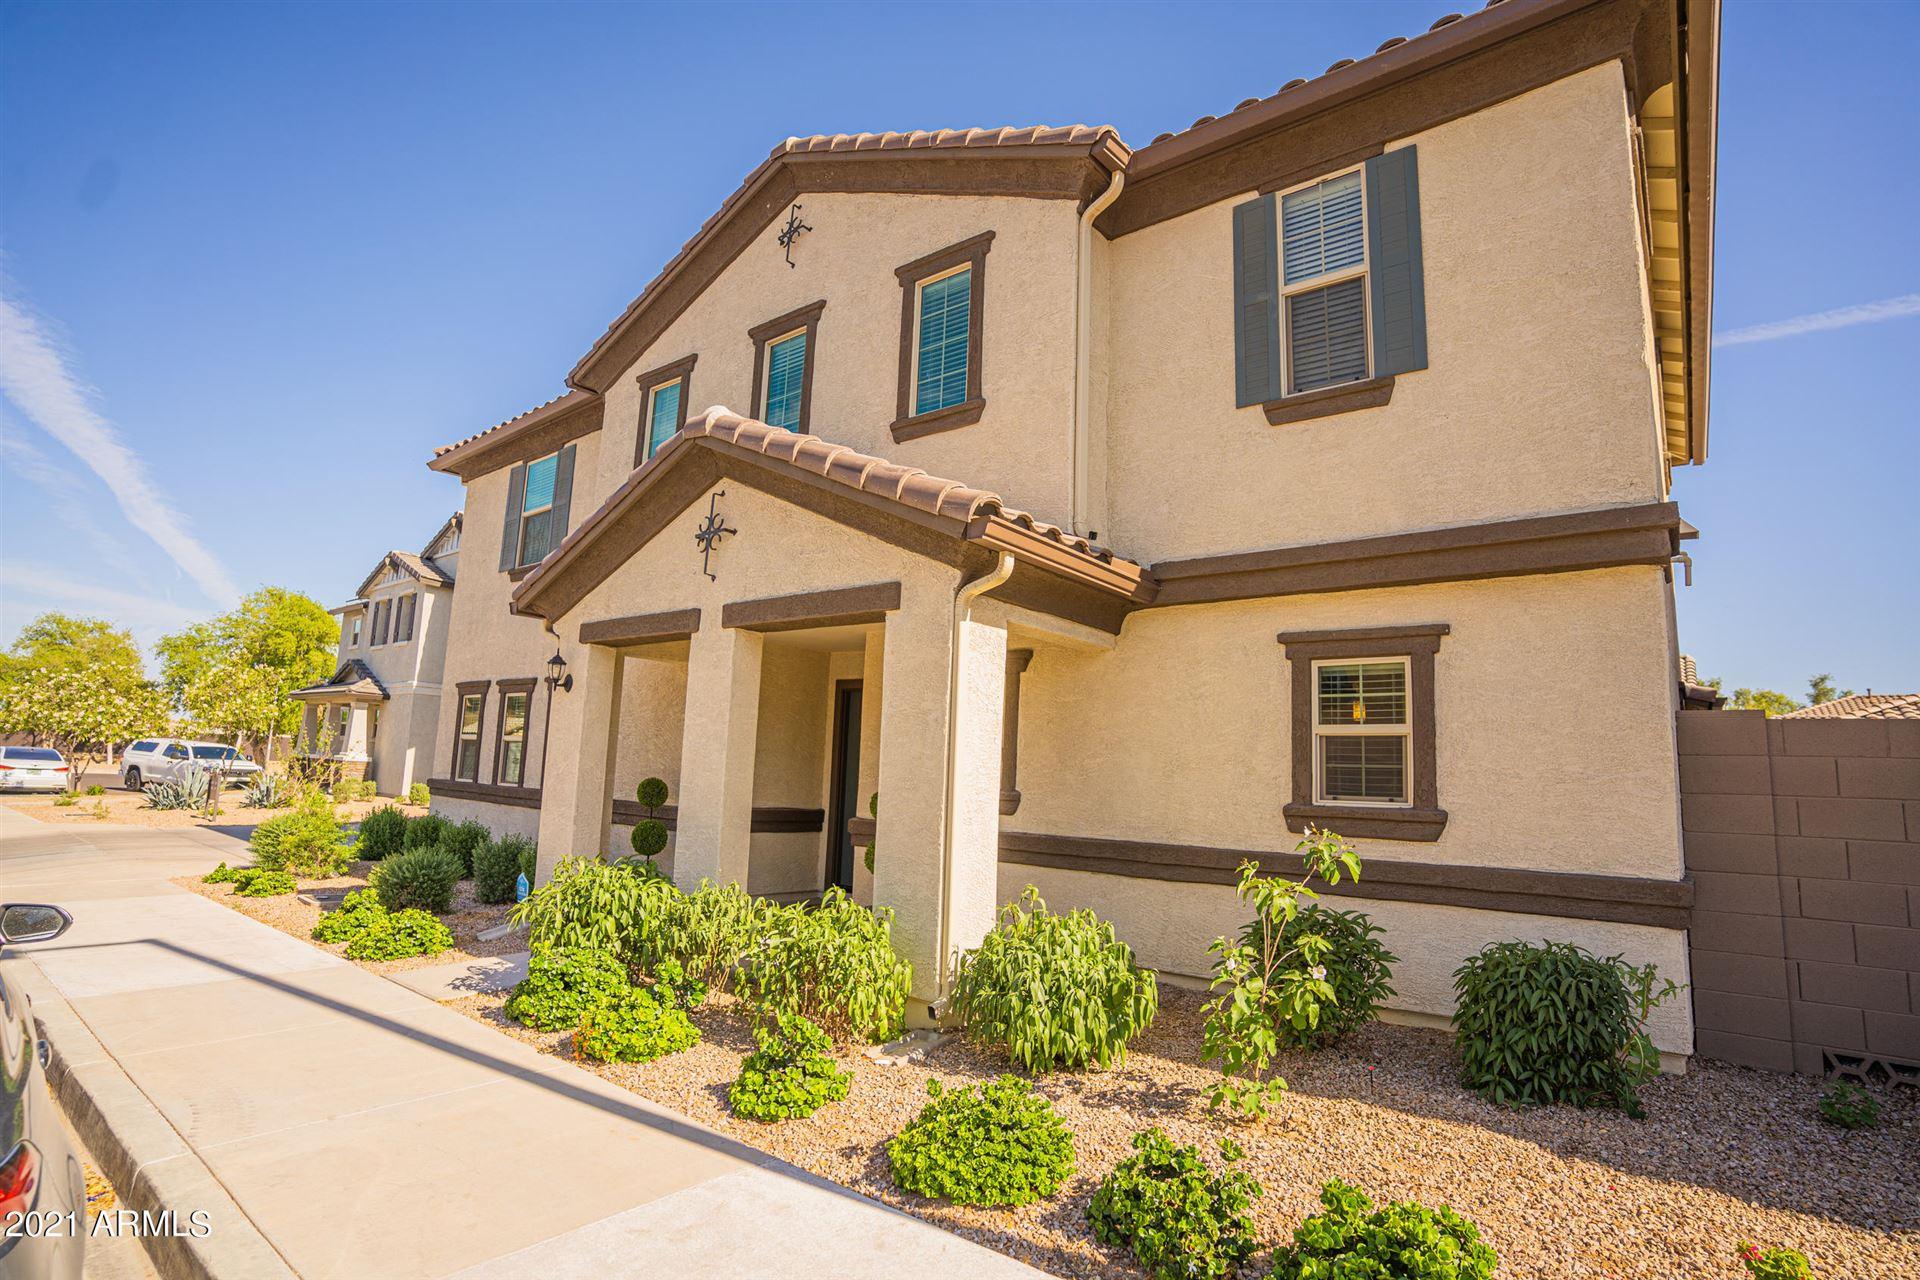 16447 W CULVER Street, Goodyear, AZ 85338 - MLS#: 6254576